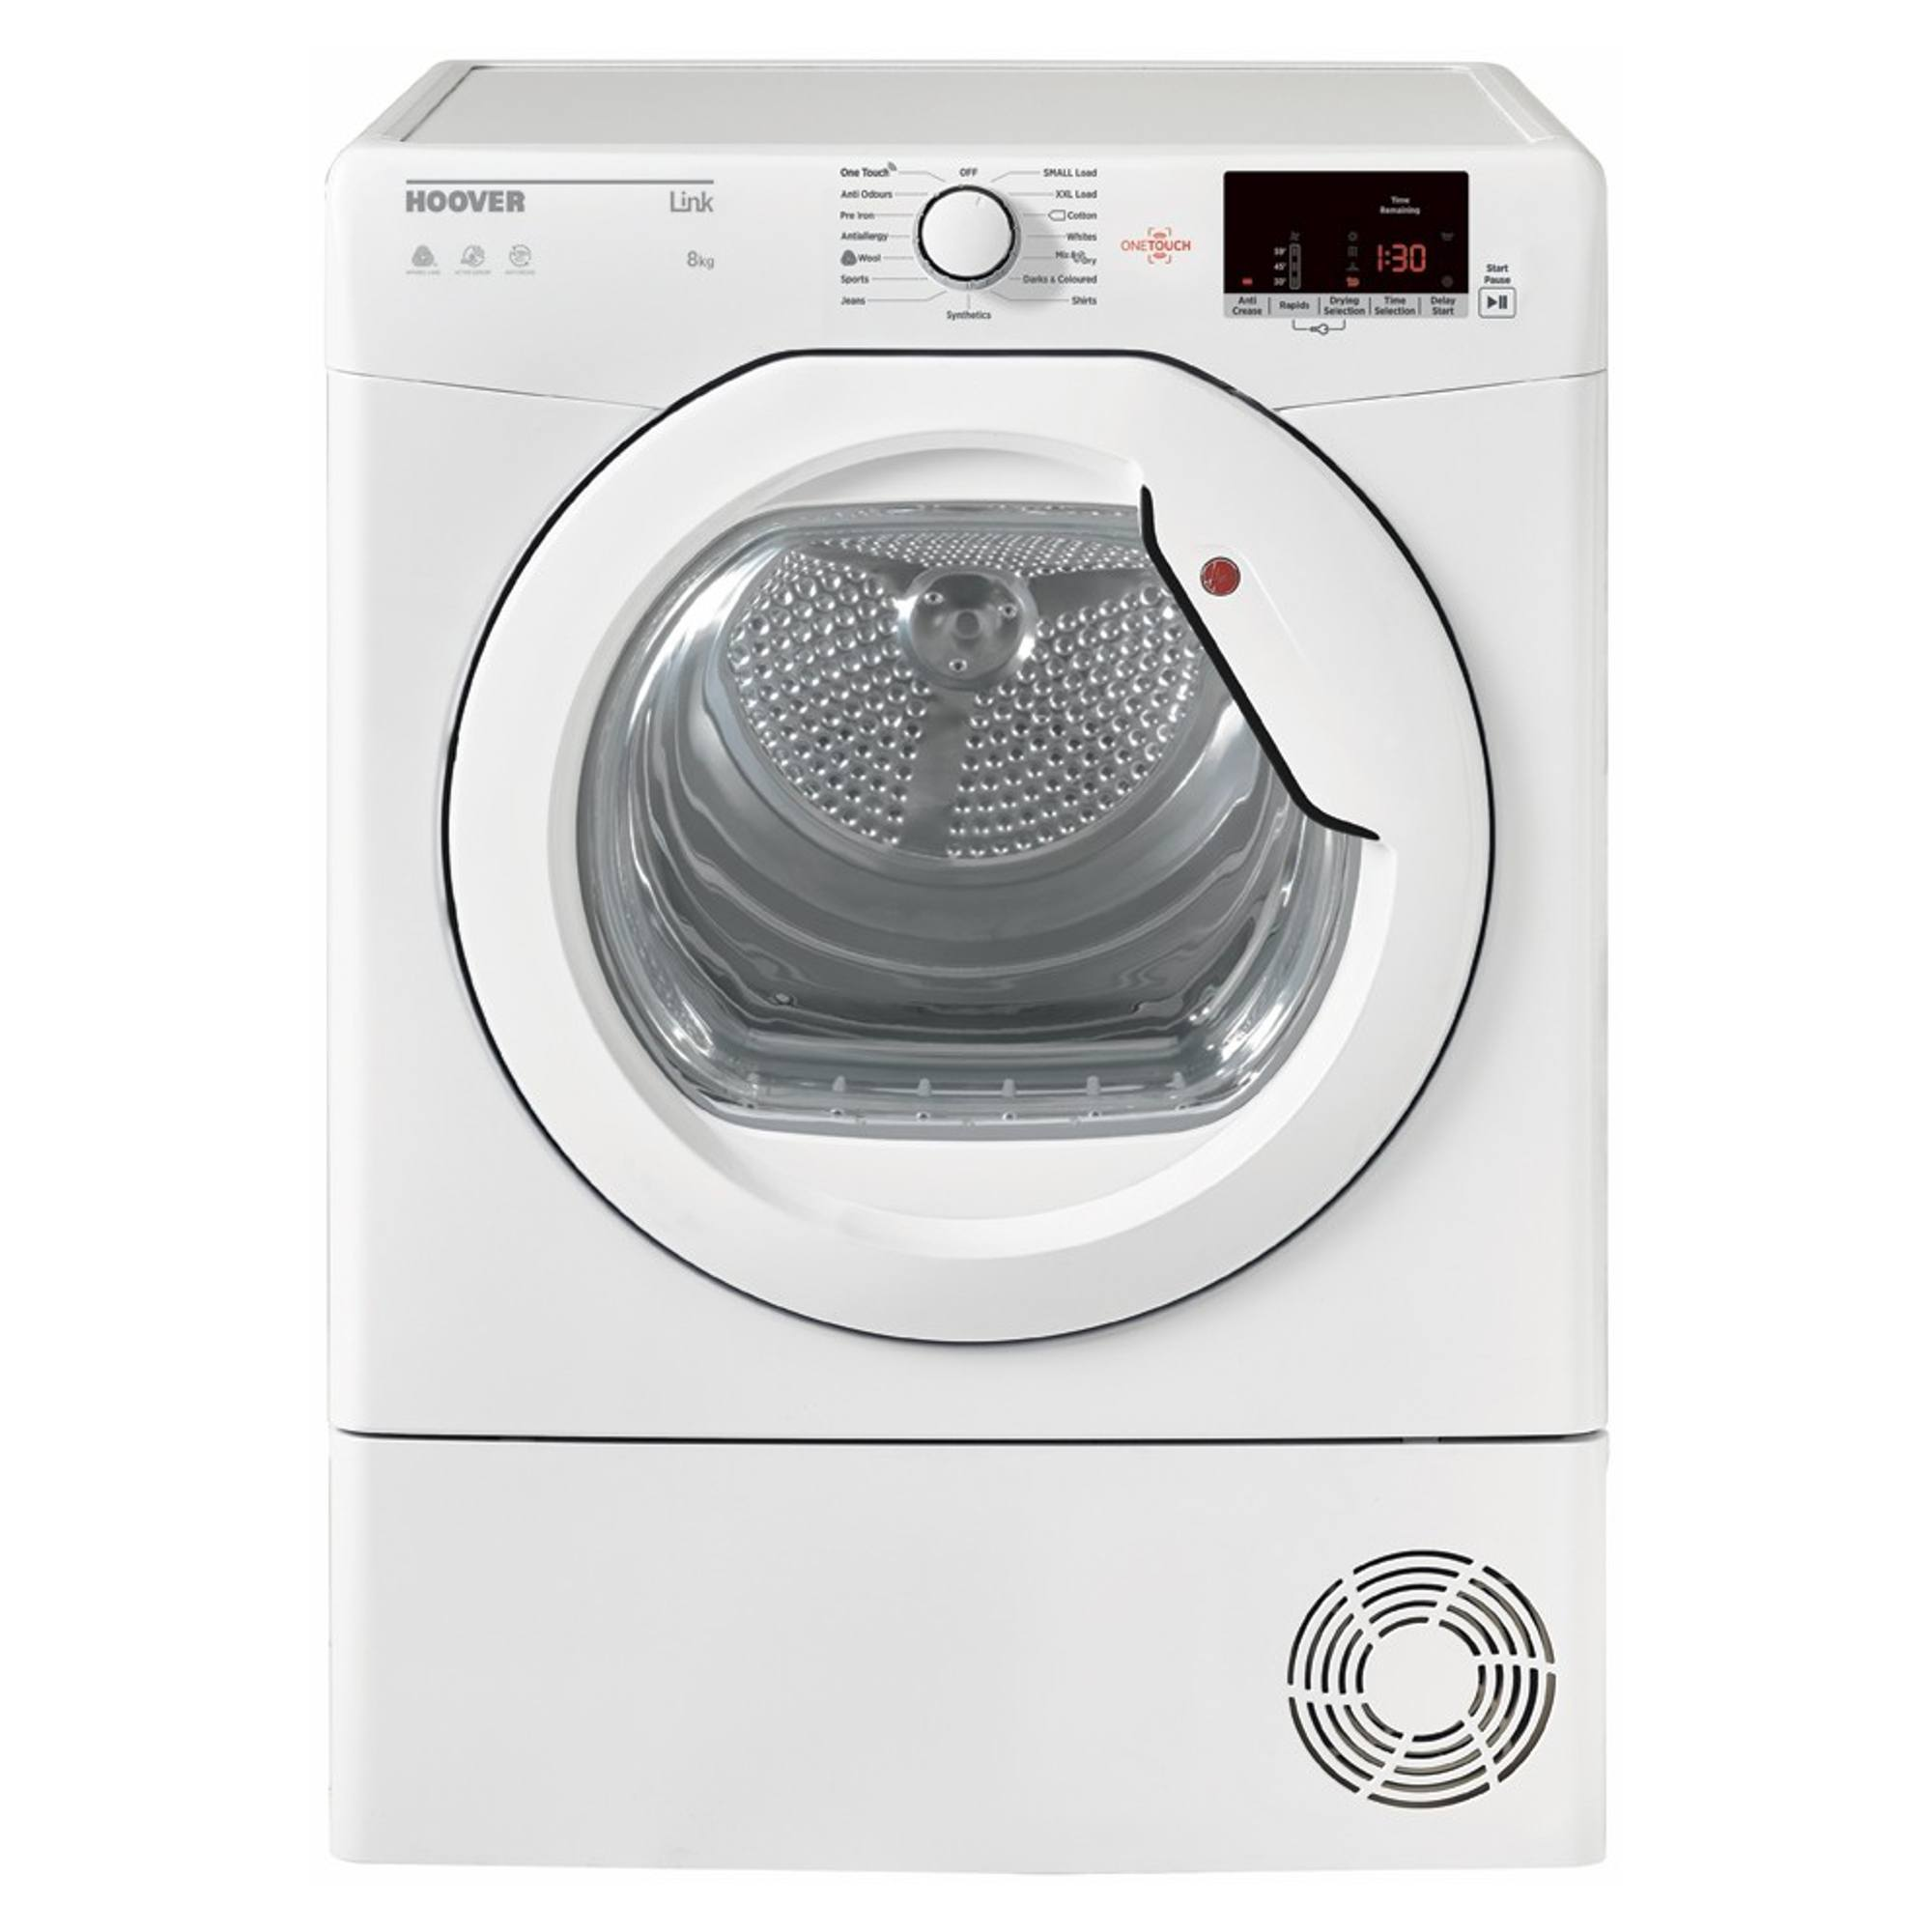 Hoover Hlc8dcg 8kg Condenser Tumble Dryer White Hughes